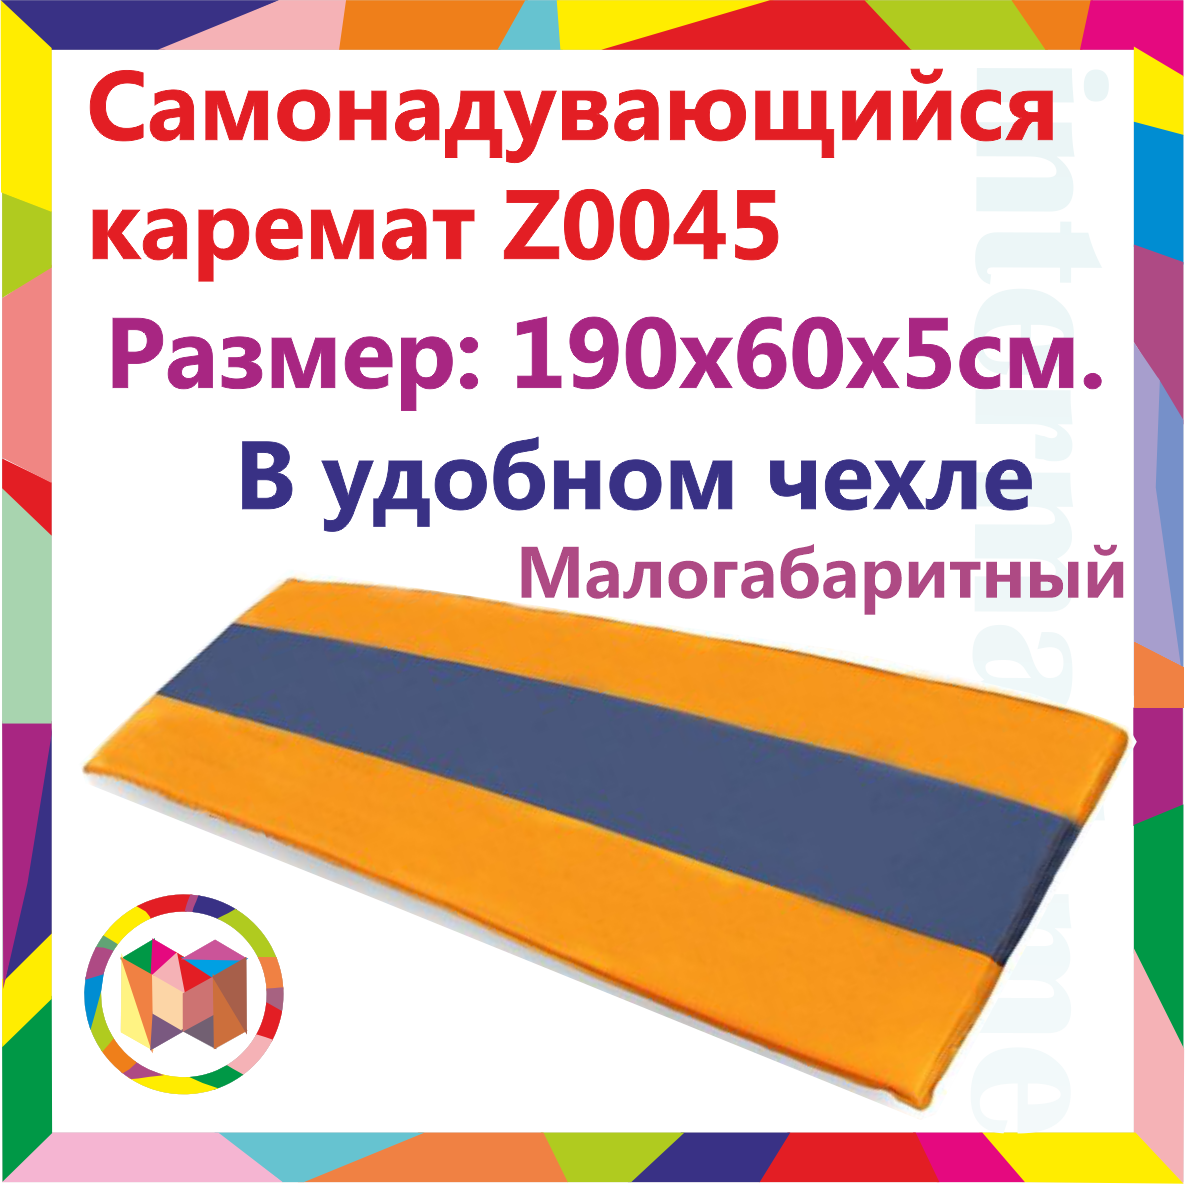 Самонадувающийся каремат, коврик туристический, одноместный 190х60х5 см